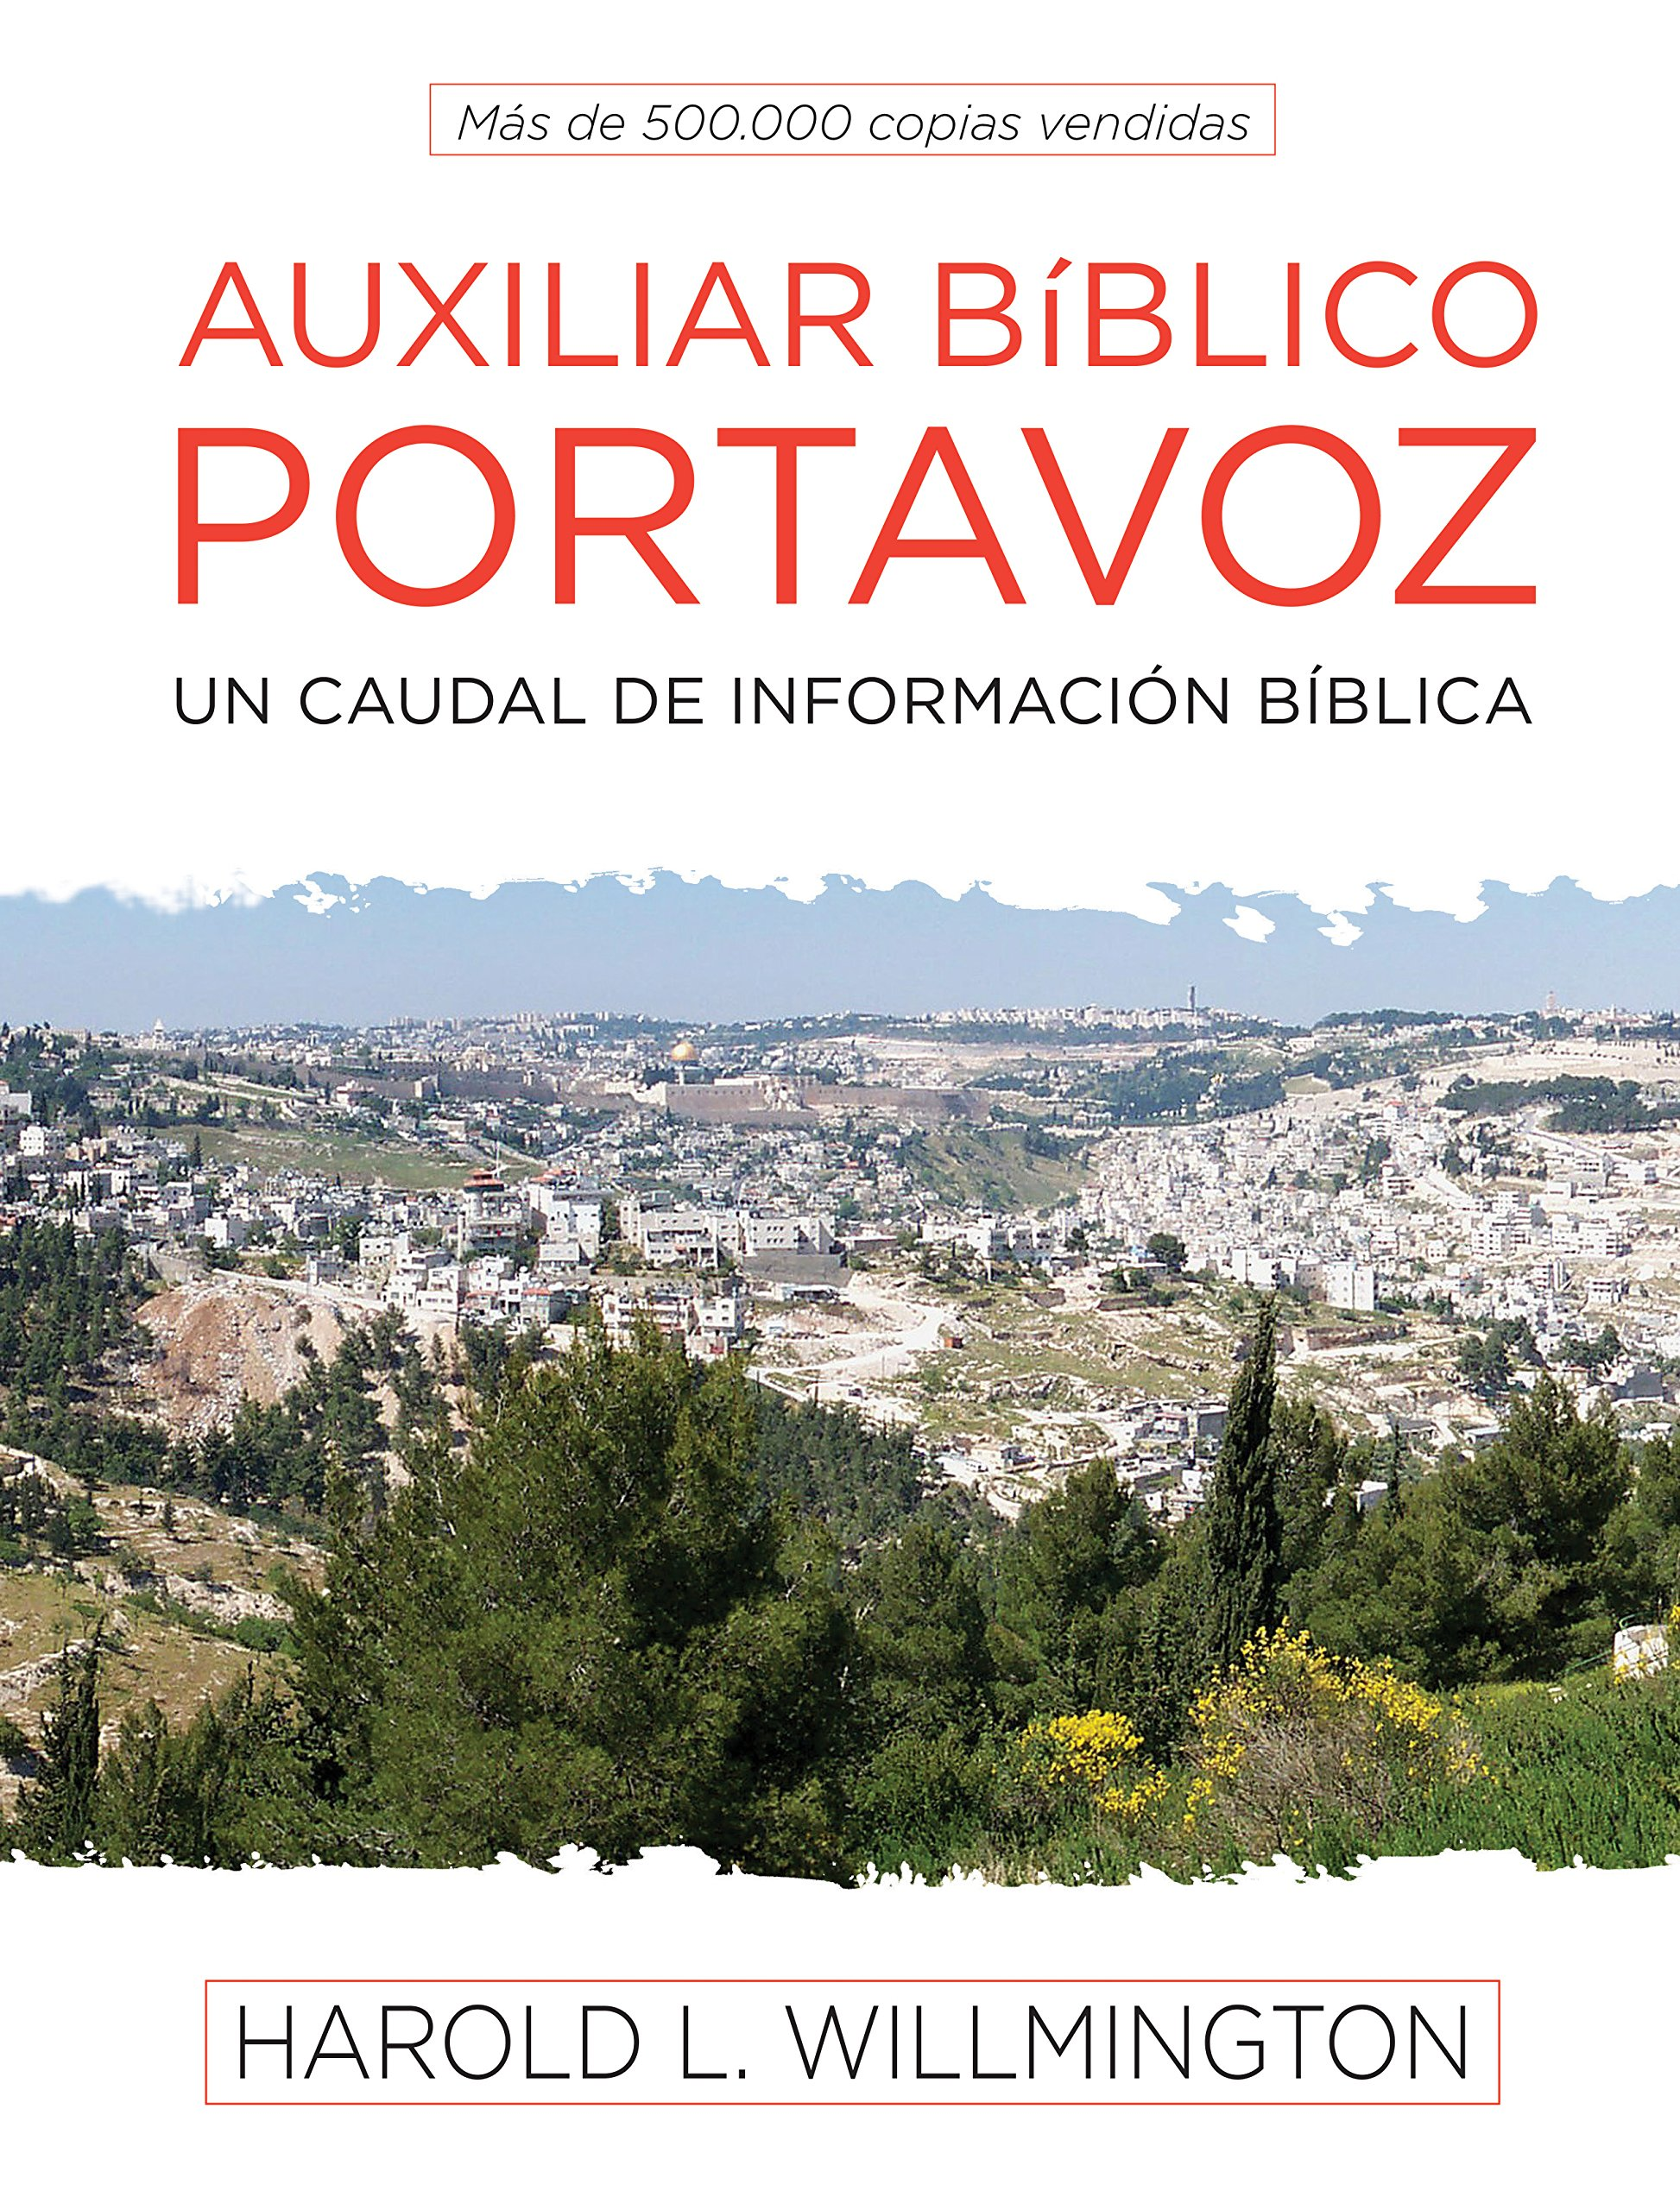 Auxiliar bíblico Portavoz (Spanish Edition): Harold L. Willmington:  8601421983266: Amazon.com: Books